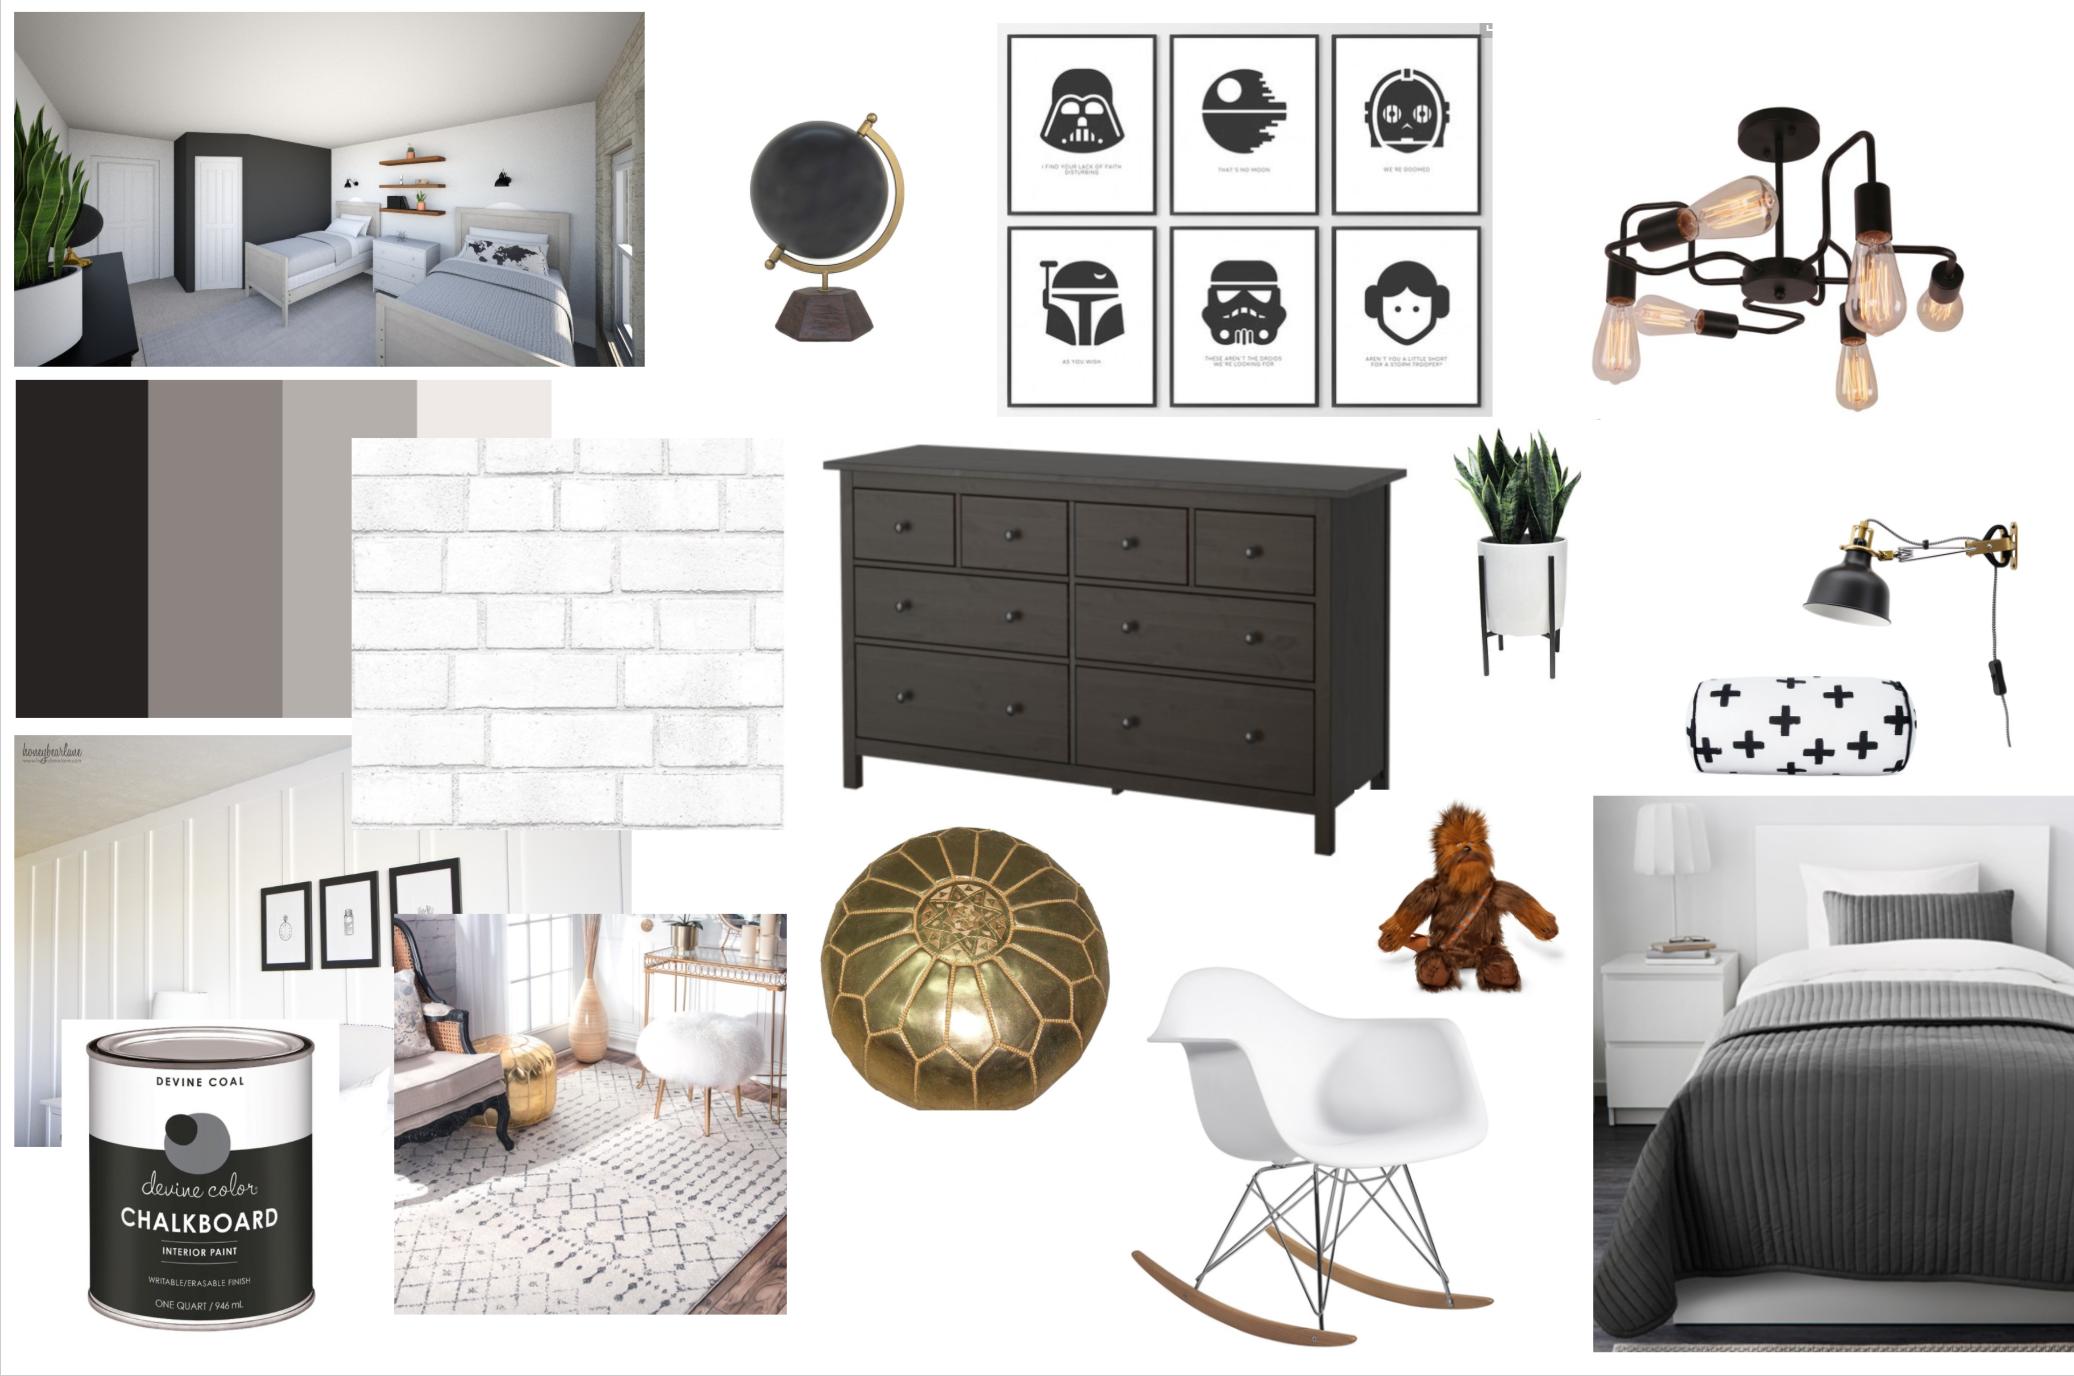 Modern Farmhouse Boys Room Plans - Honeybear Lane